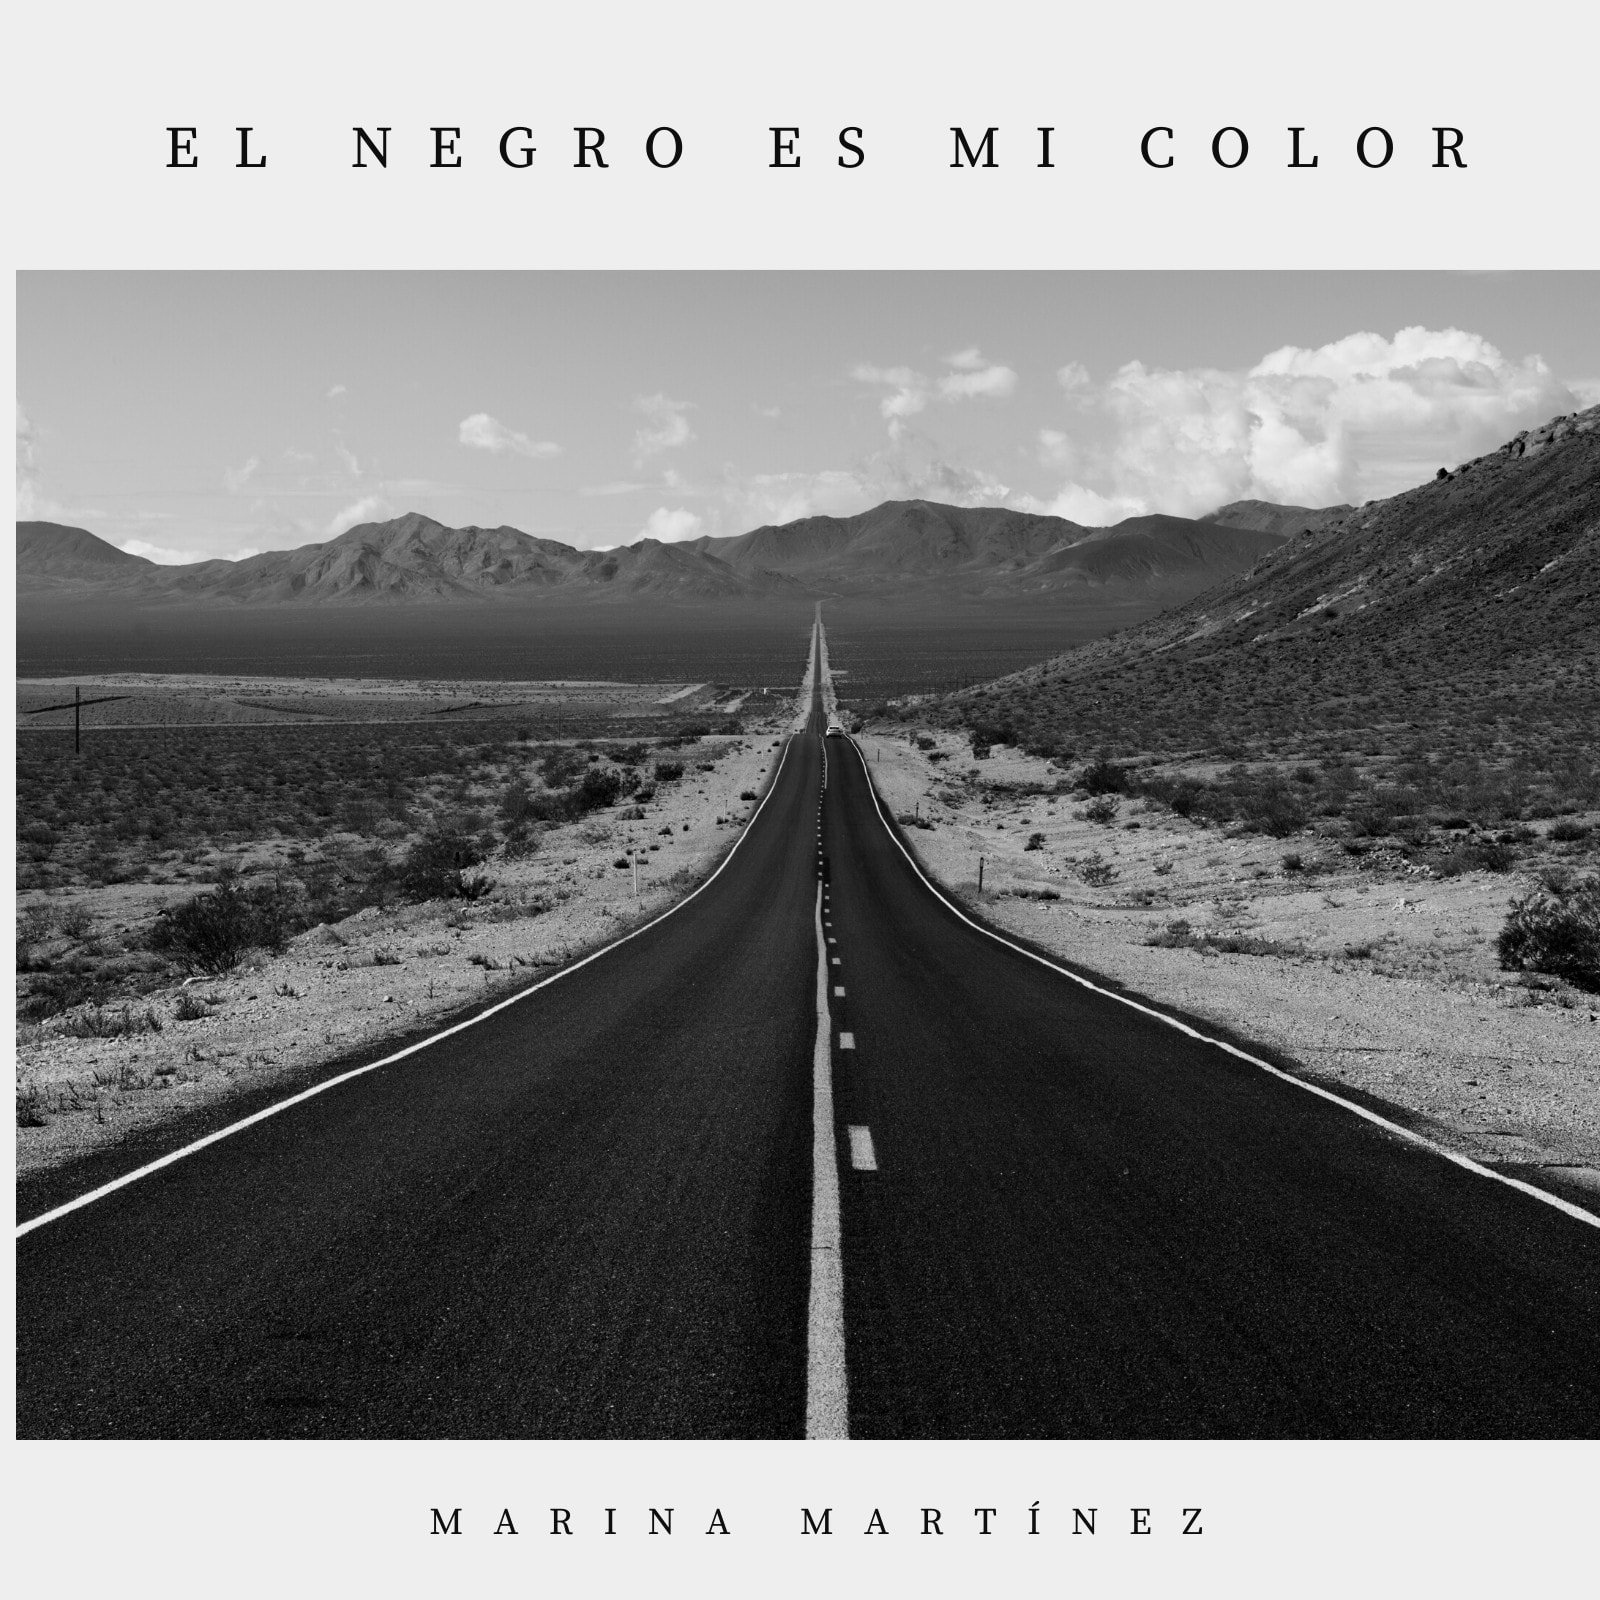 Negro Blanco Carretera Foto Música Álbum Portada